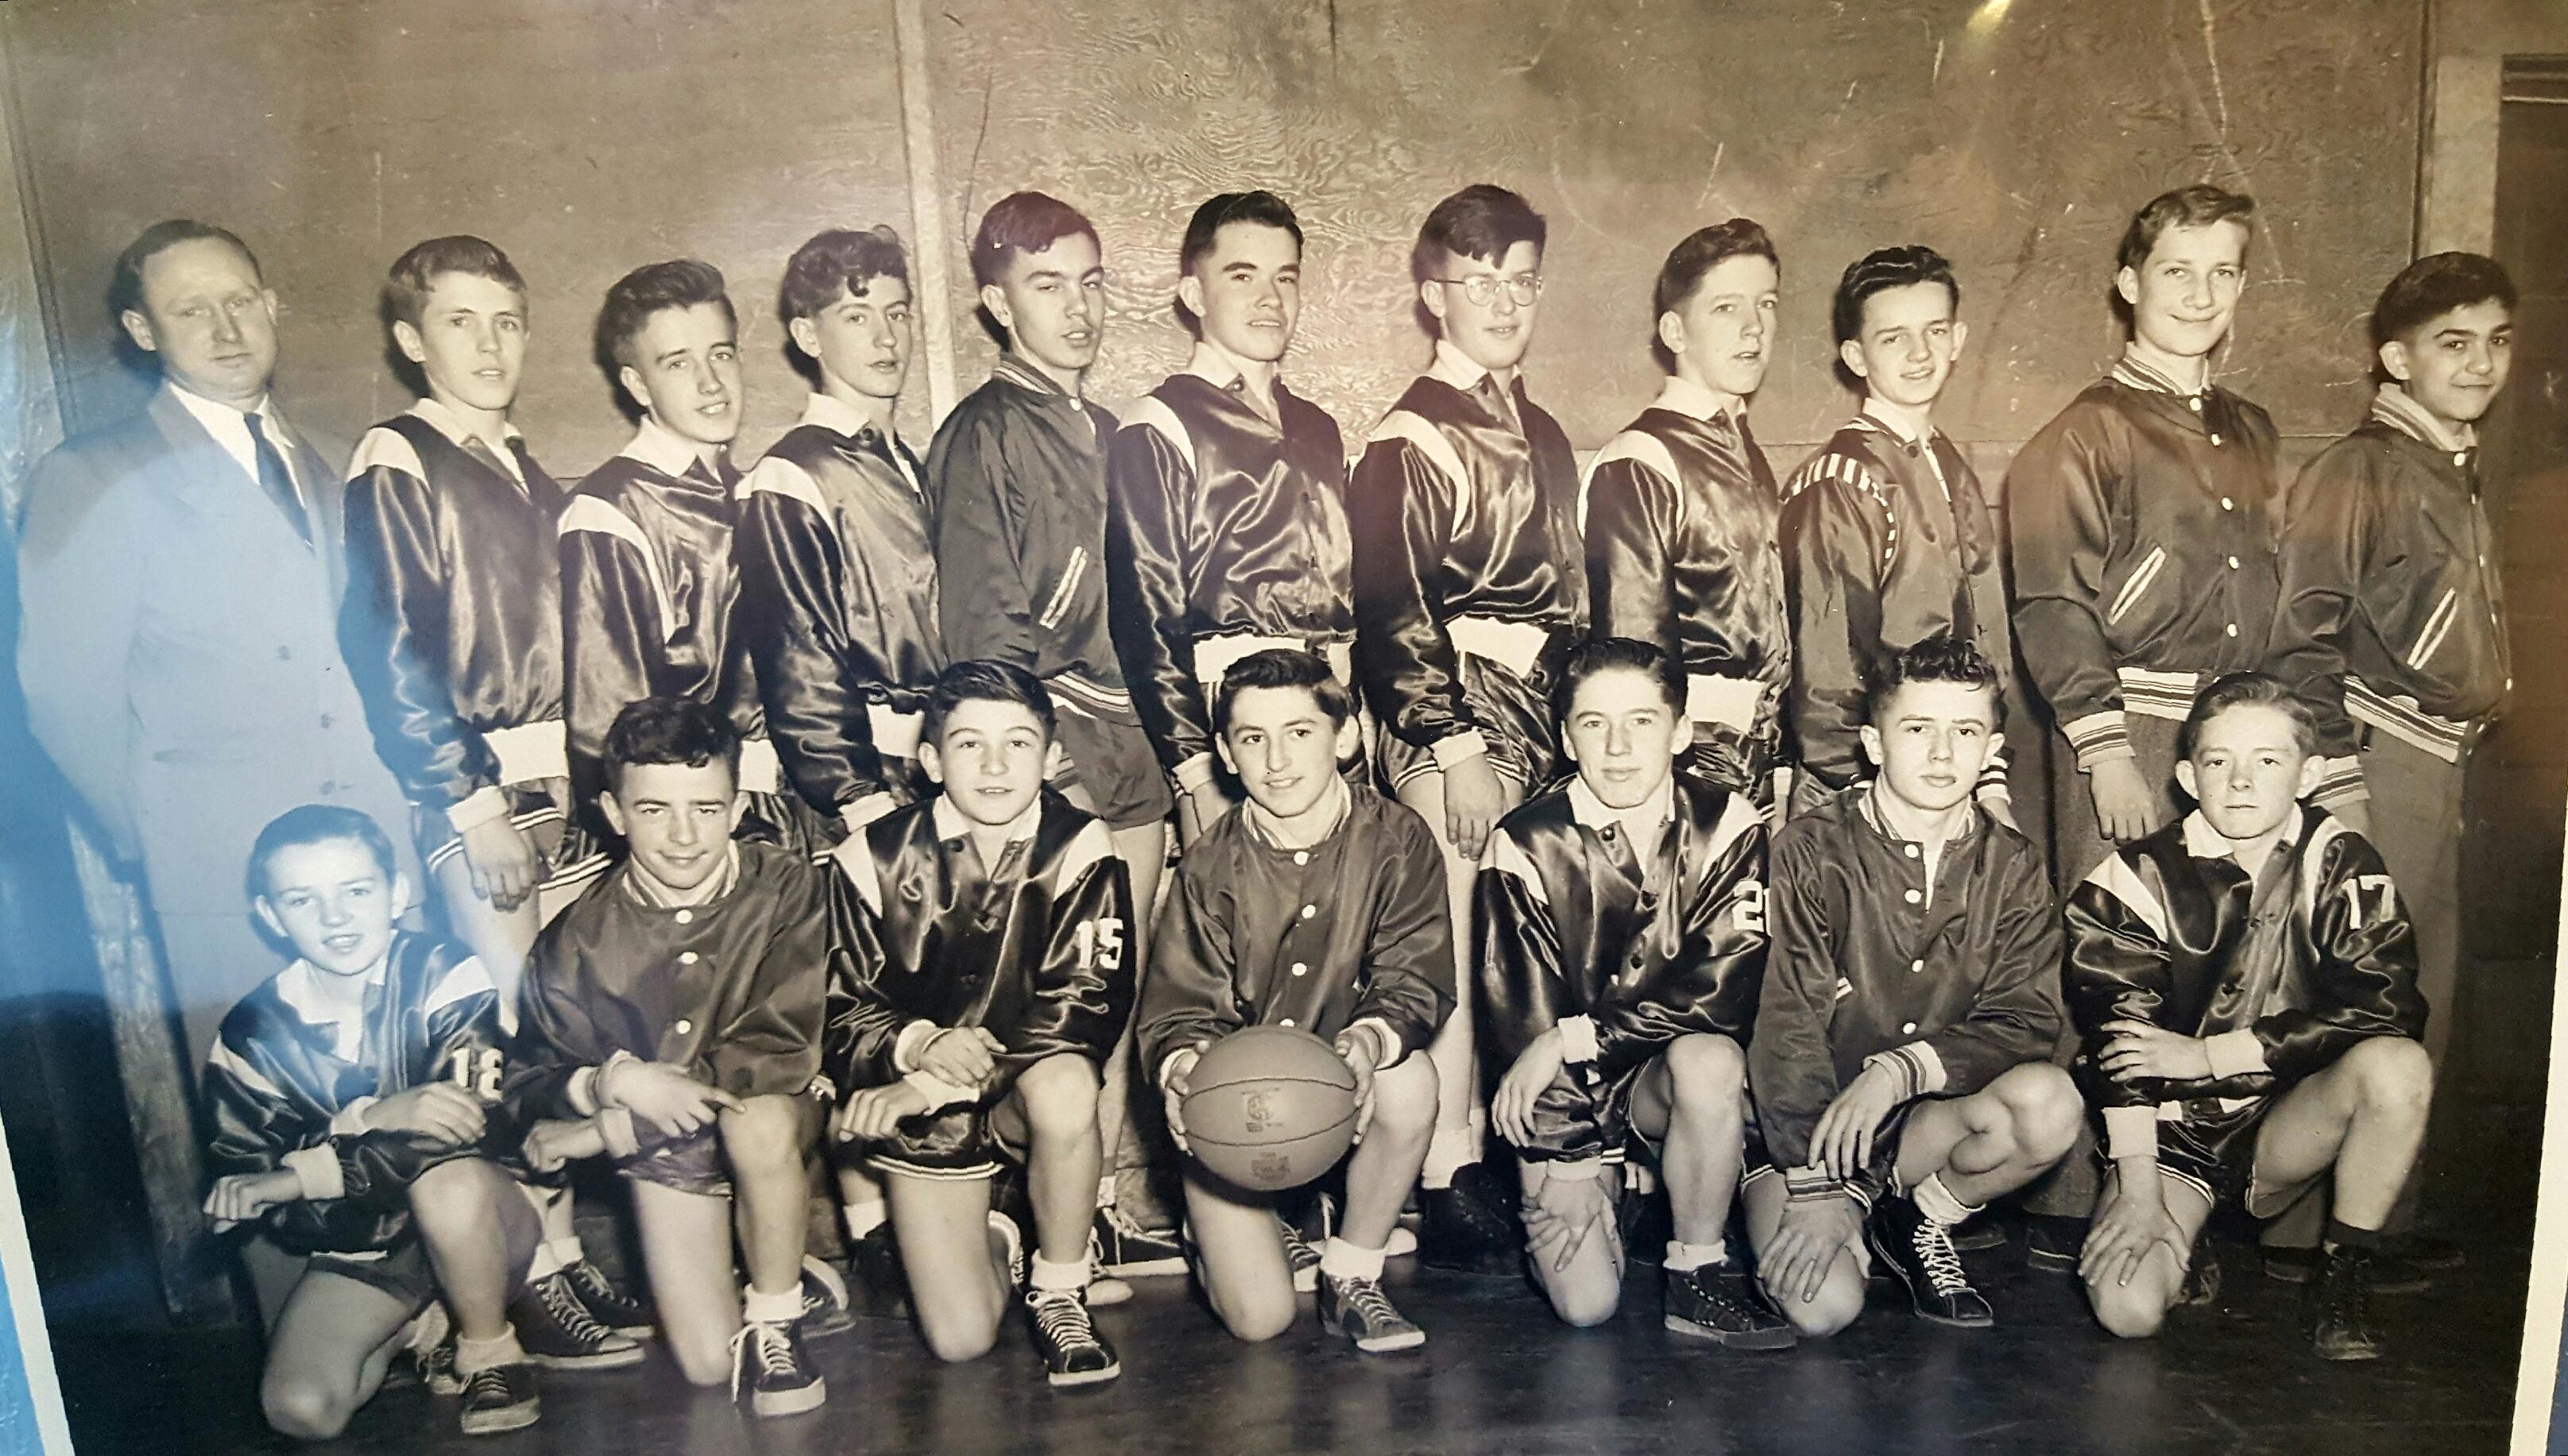 Hoosic Valley JV, 1949-1950, Coach Furlong and ??